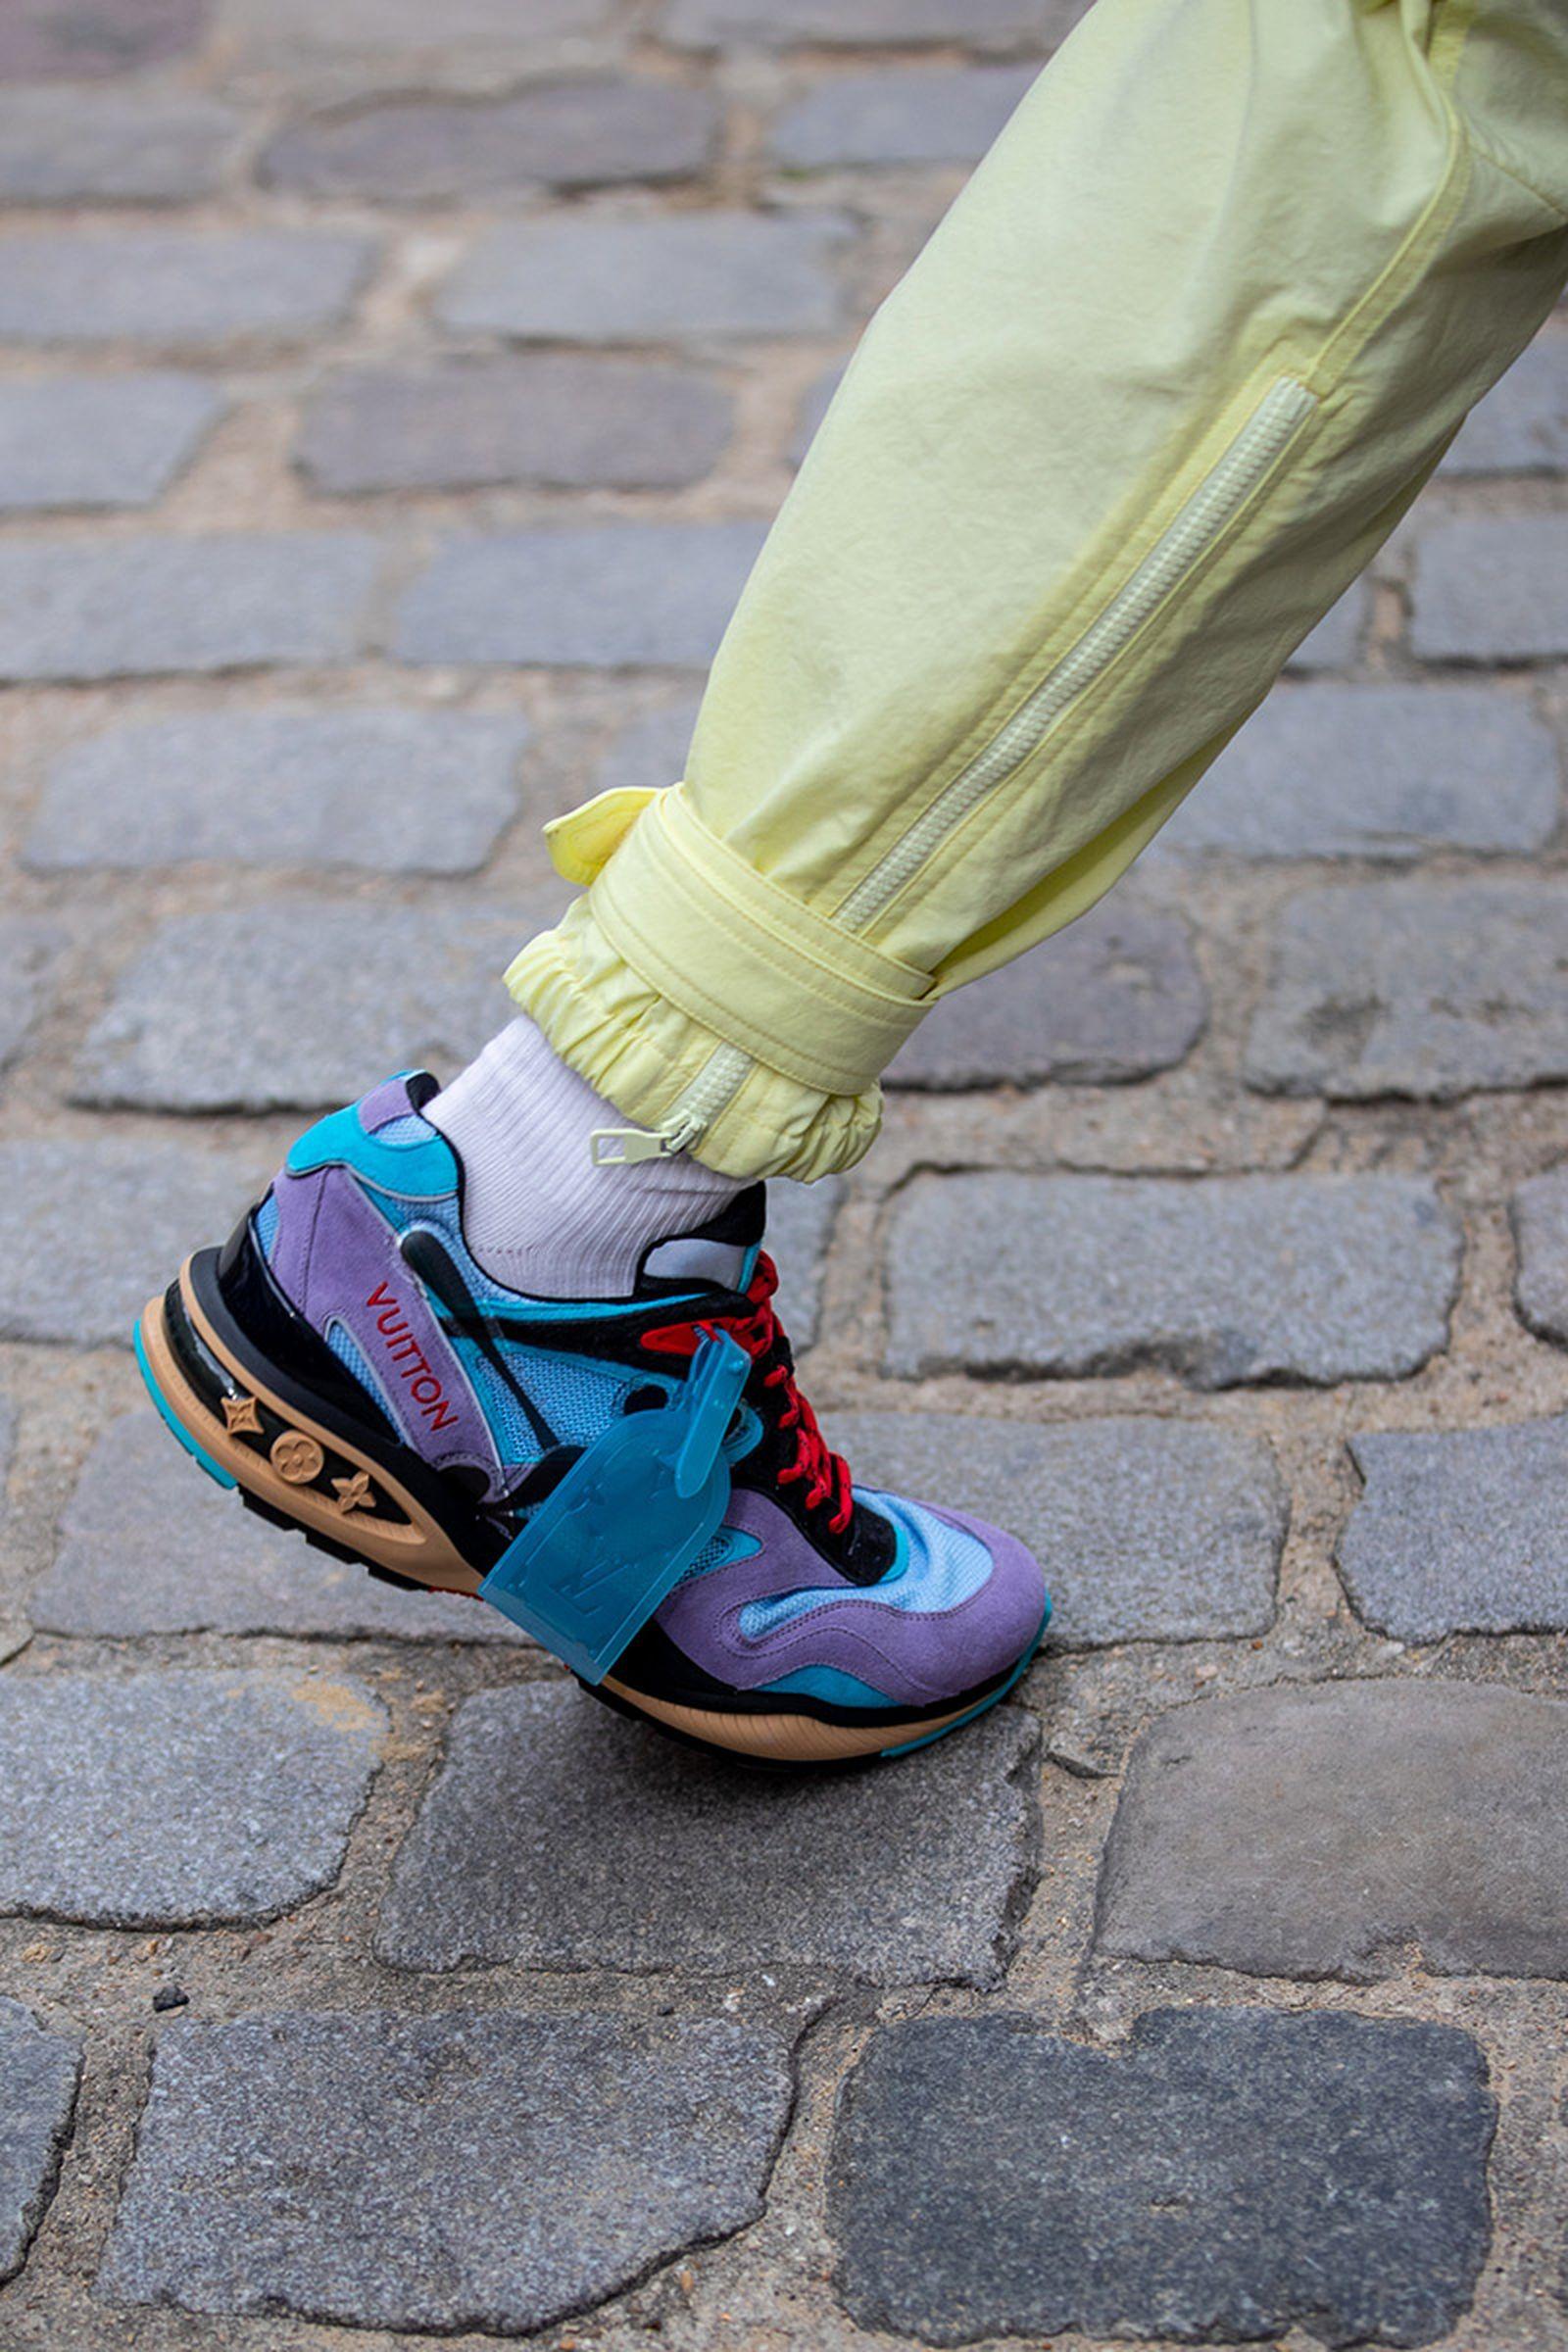 paris fashion week ss20 best sneakers louis vuitton Nike OAMC OFF-WHITE c/o Virgil Abloh